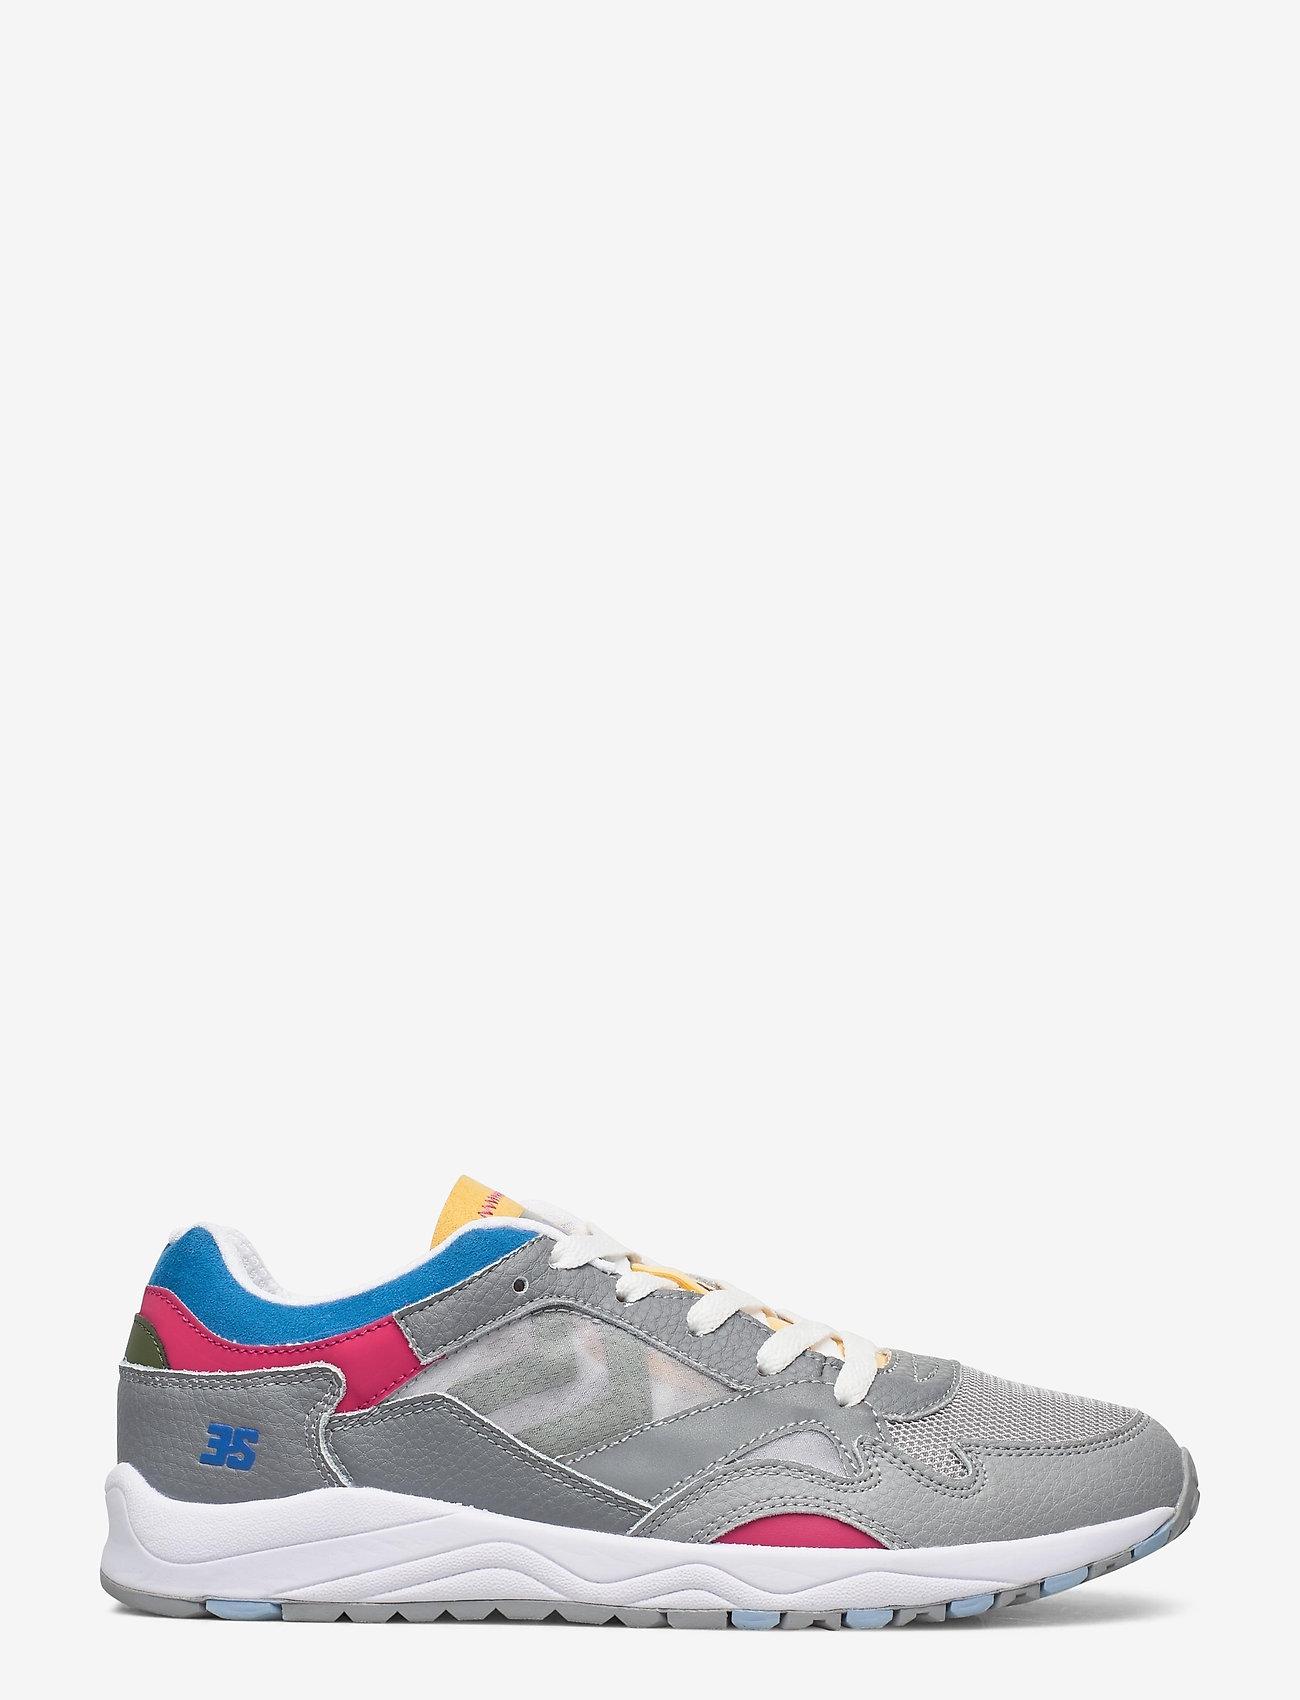 Hummel - EDMONTON 3S LEATHER - laag sneakers - sharkskin - 1